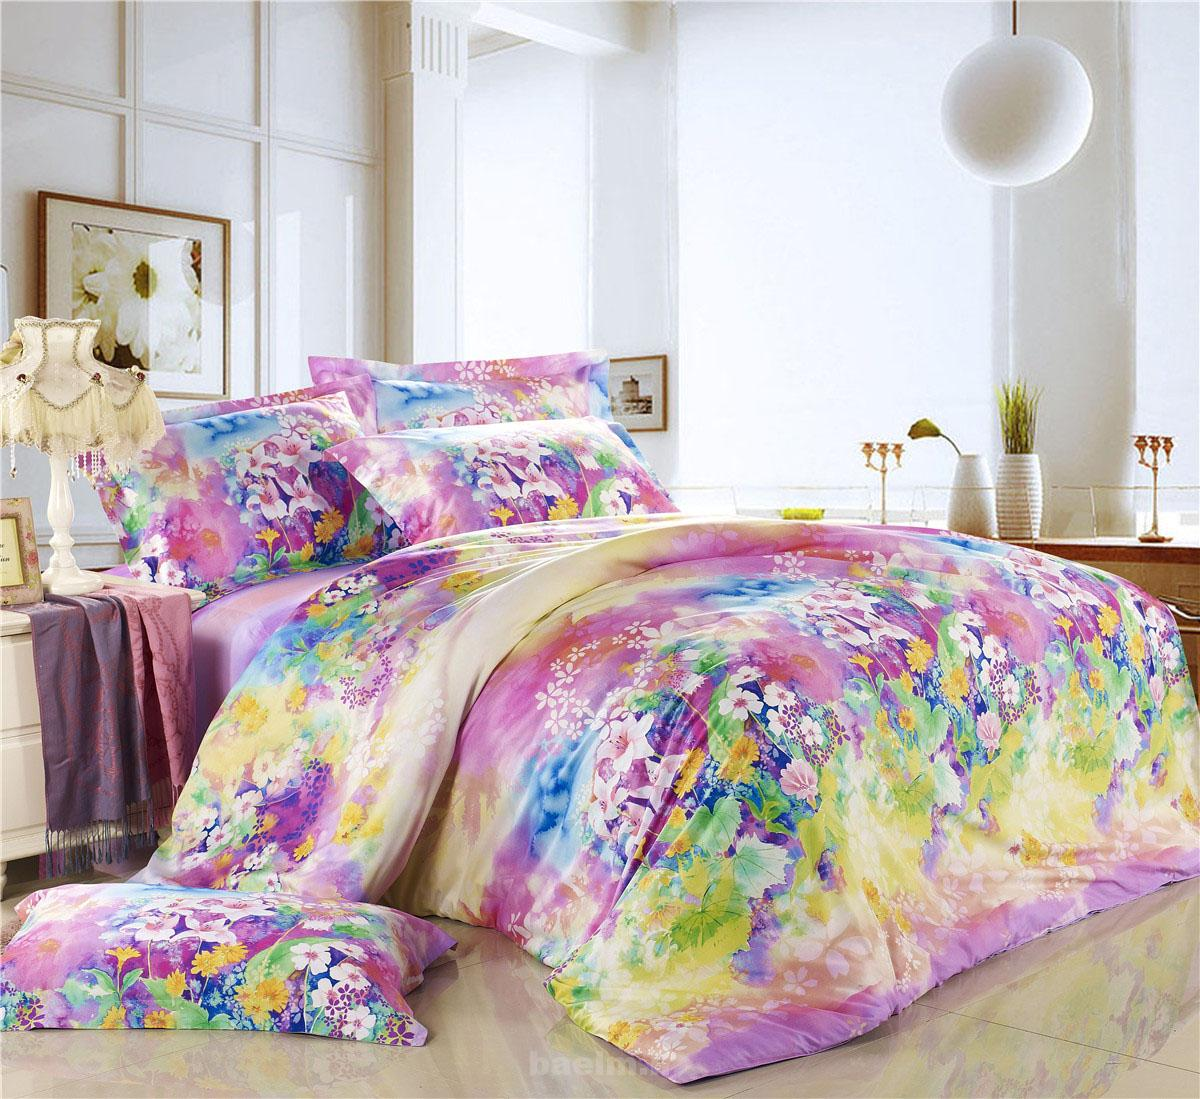 girls bedding sets 9 Girls Bedding Sets